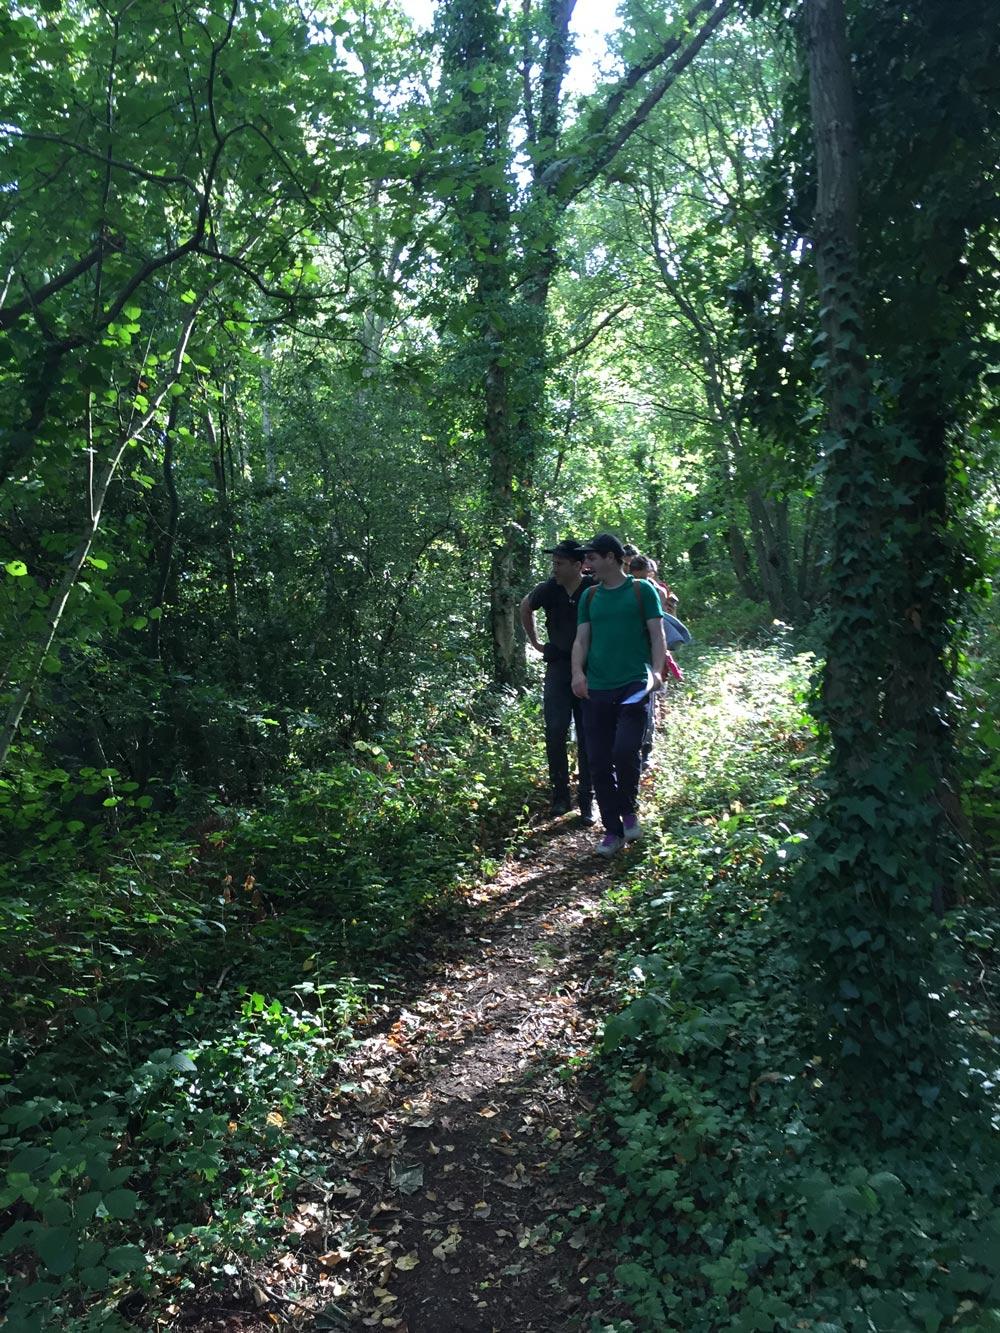 BrockleyNatureReserve-gojauntly-hana-blog-post-walk-2016